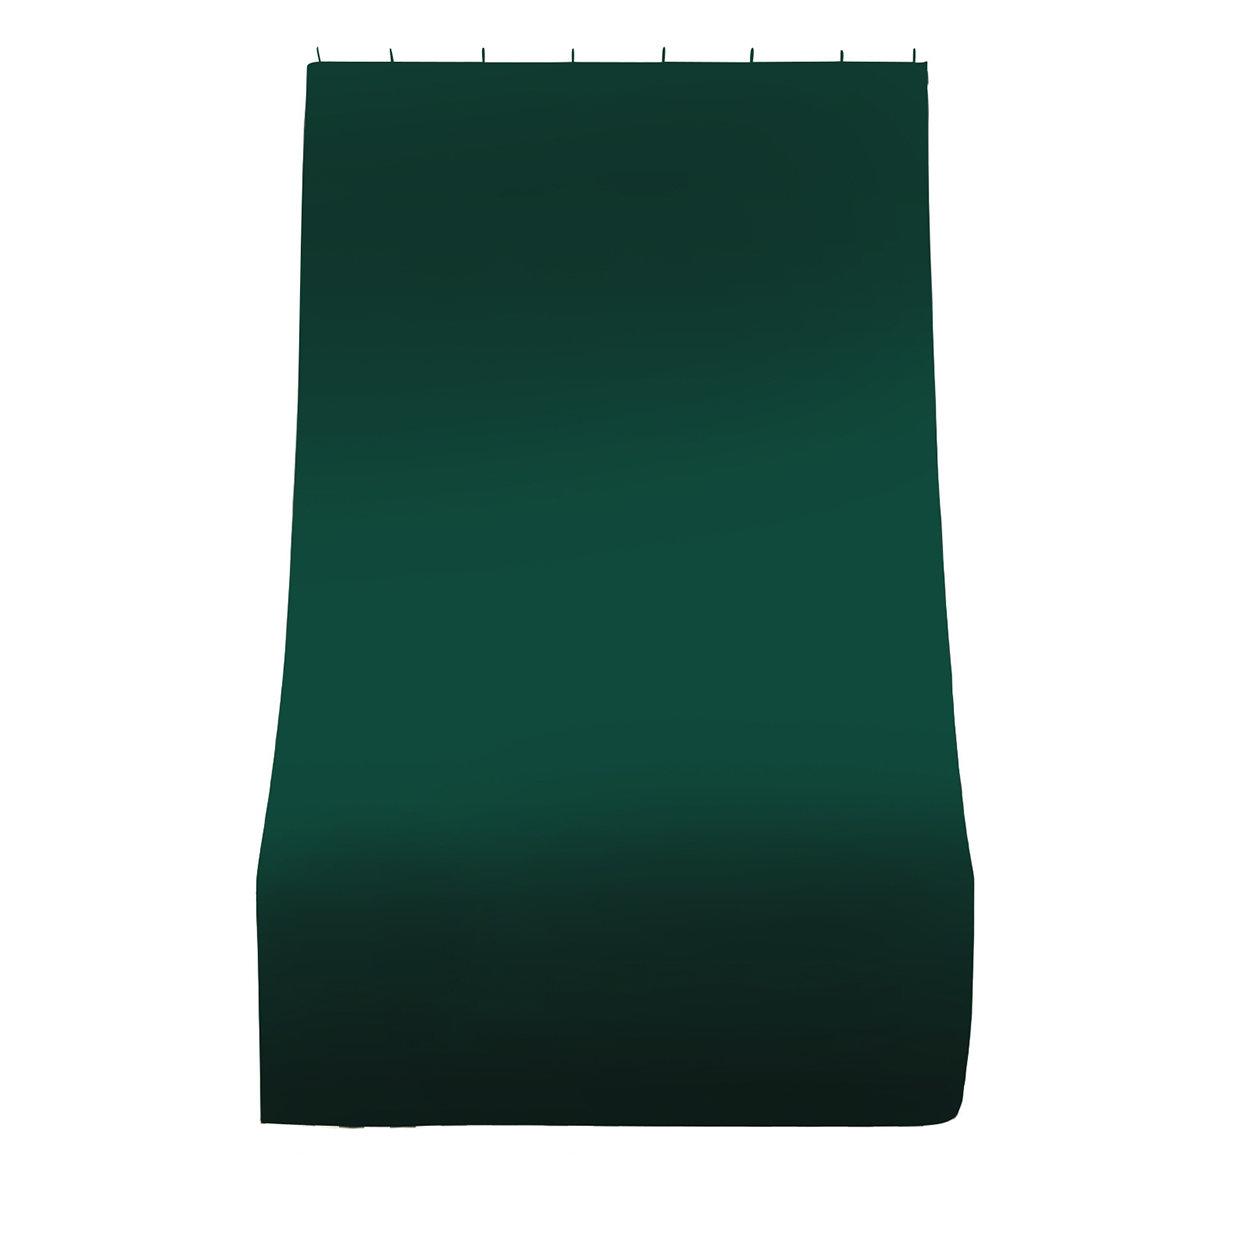 tavola estiva tenda sole idrorep.150x300cm verde